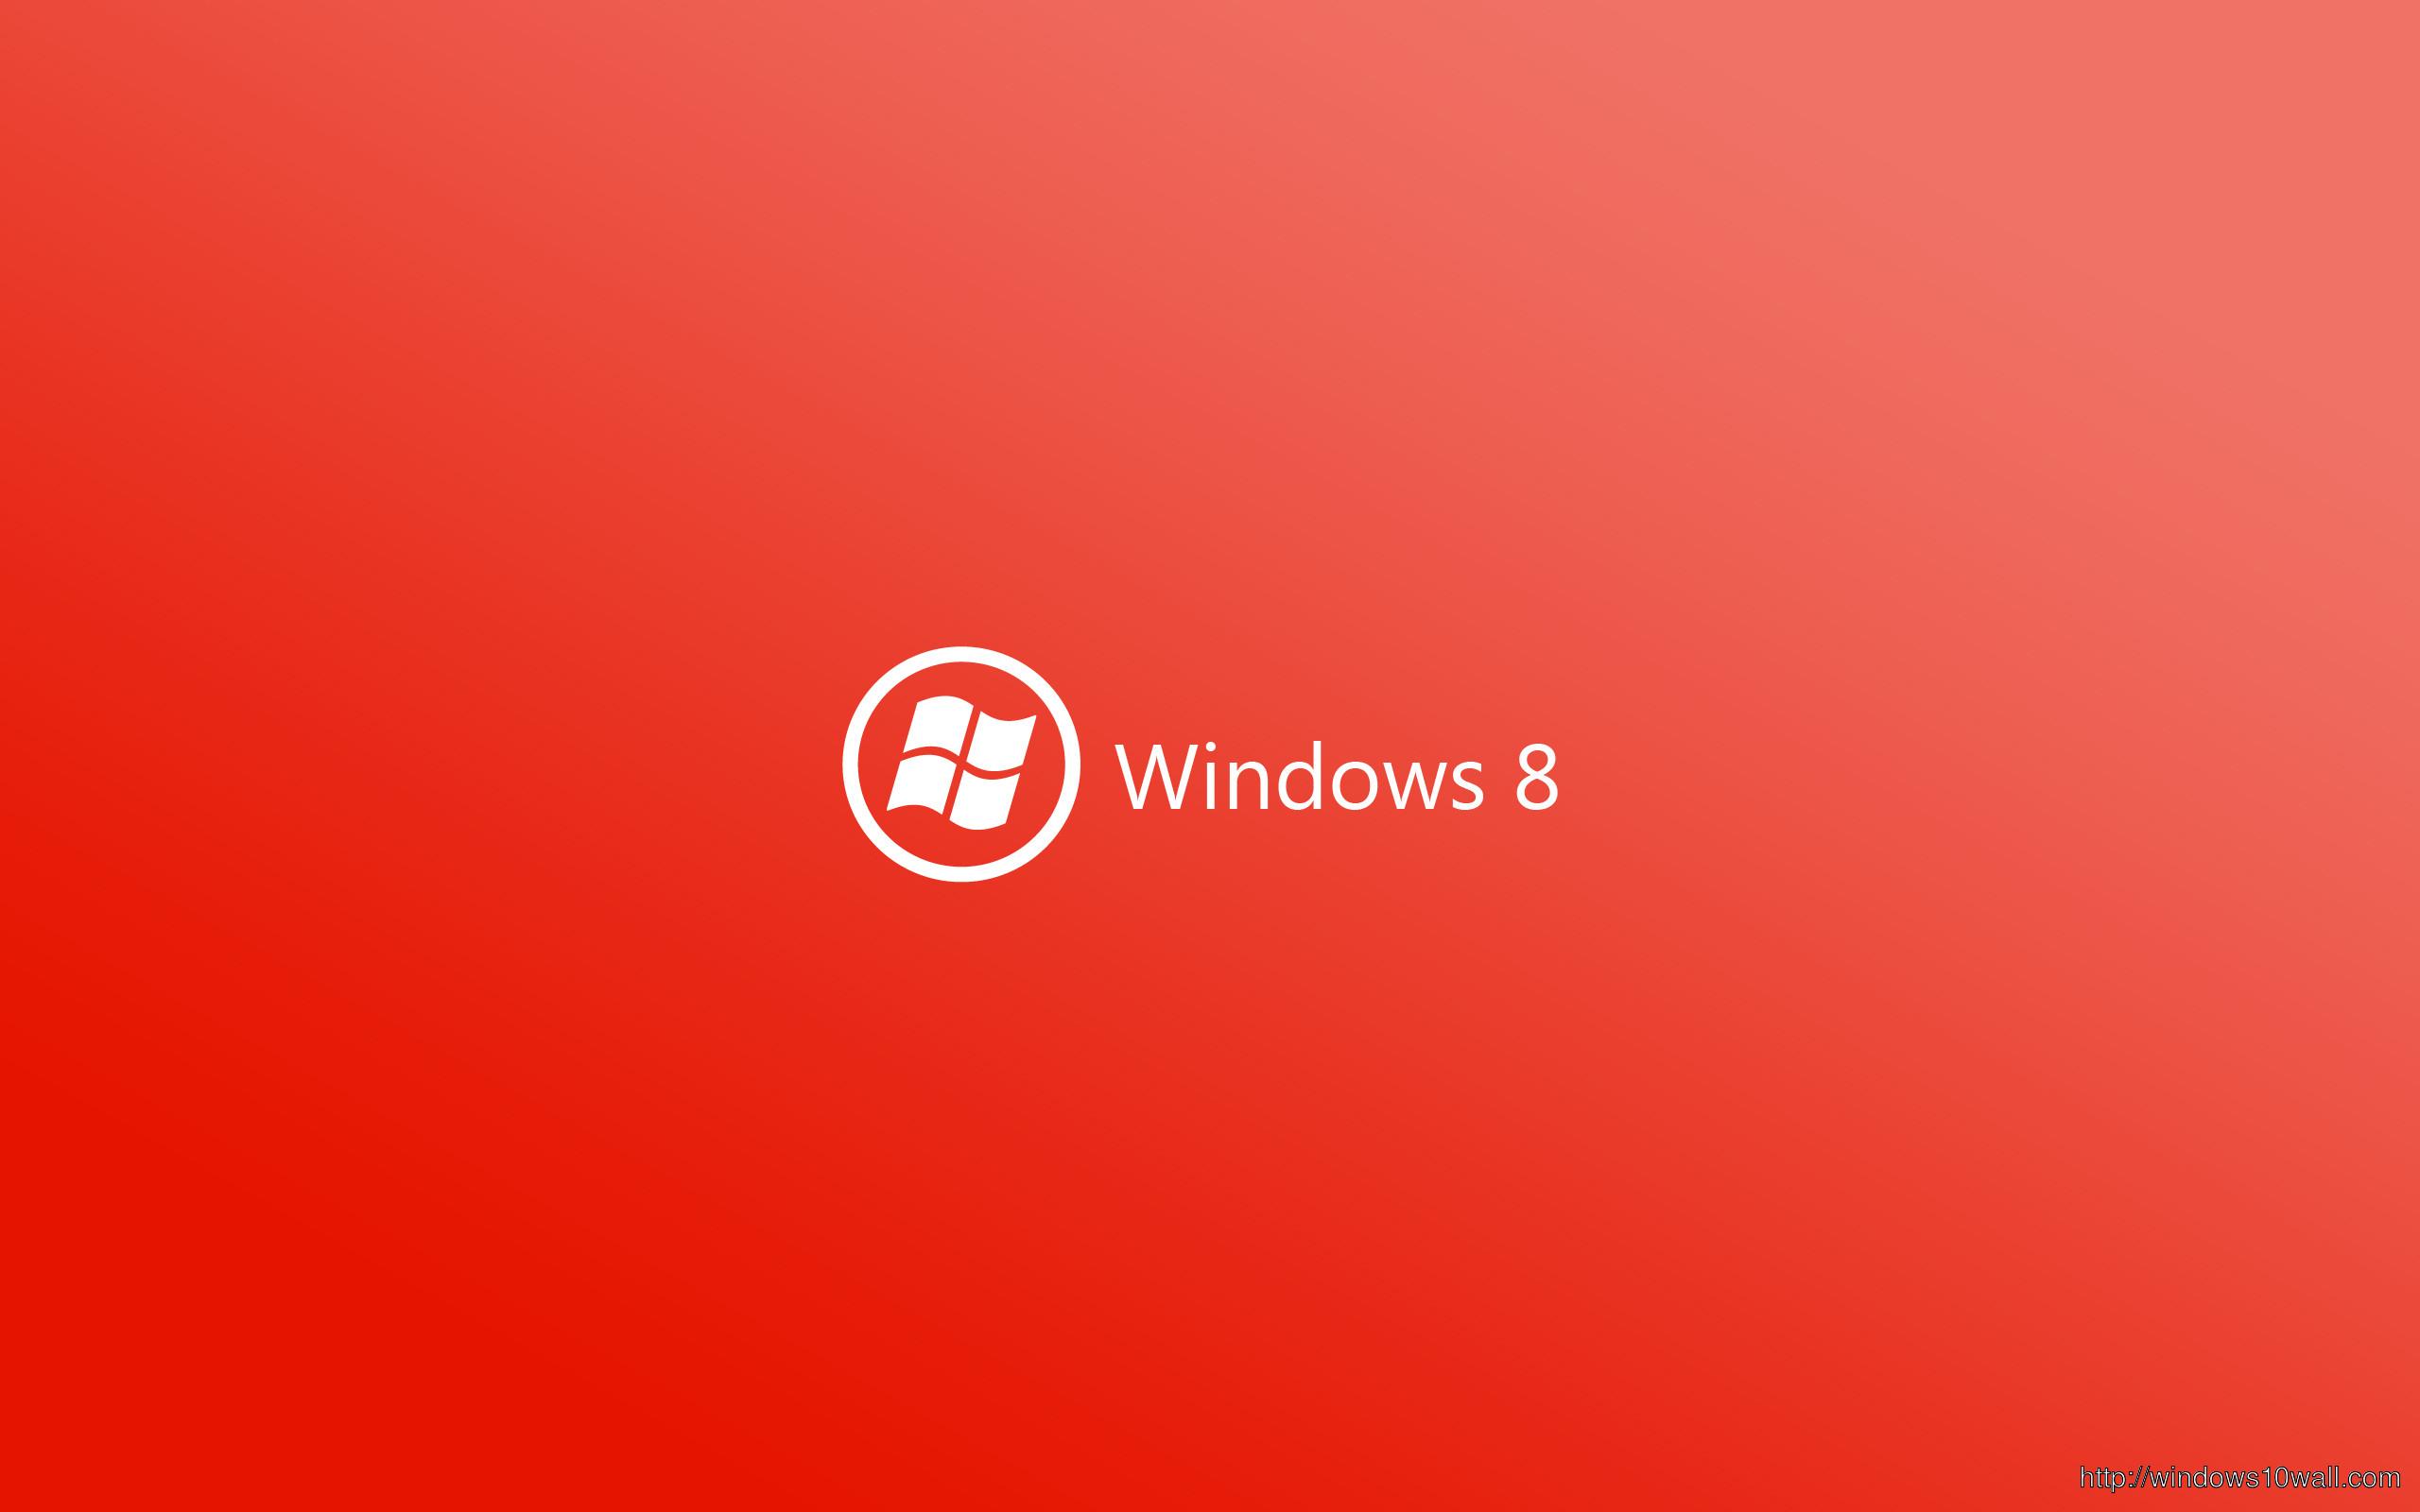 Windows 8 Wallpaper Red